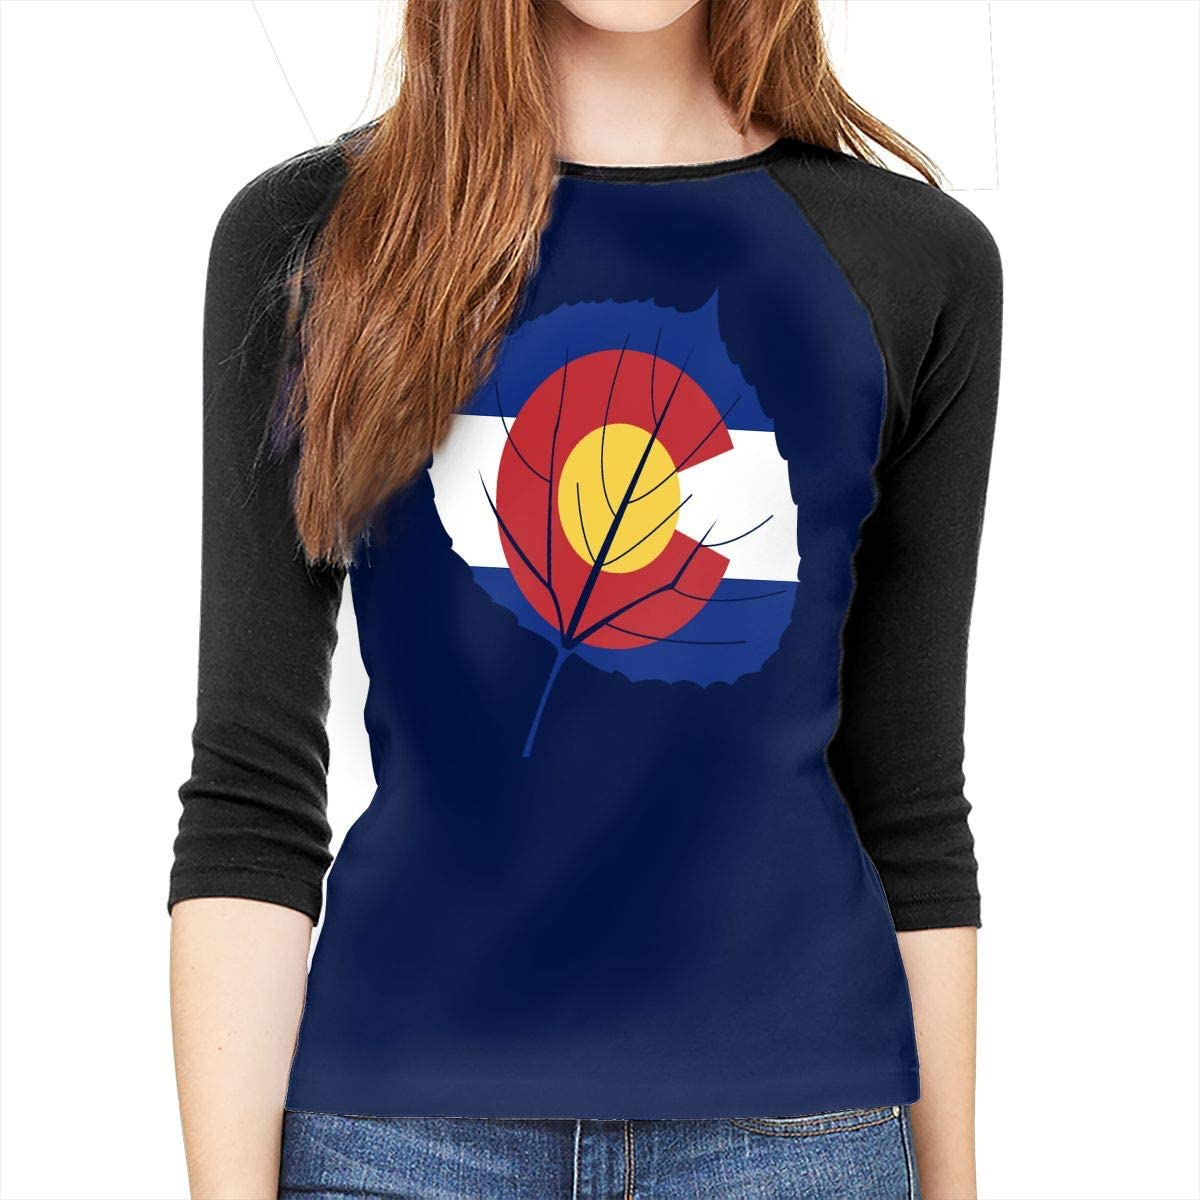 Aspen Leaf Colorado Flag Adult Womens Long-Sleeved Tee Shirts